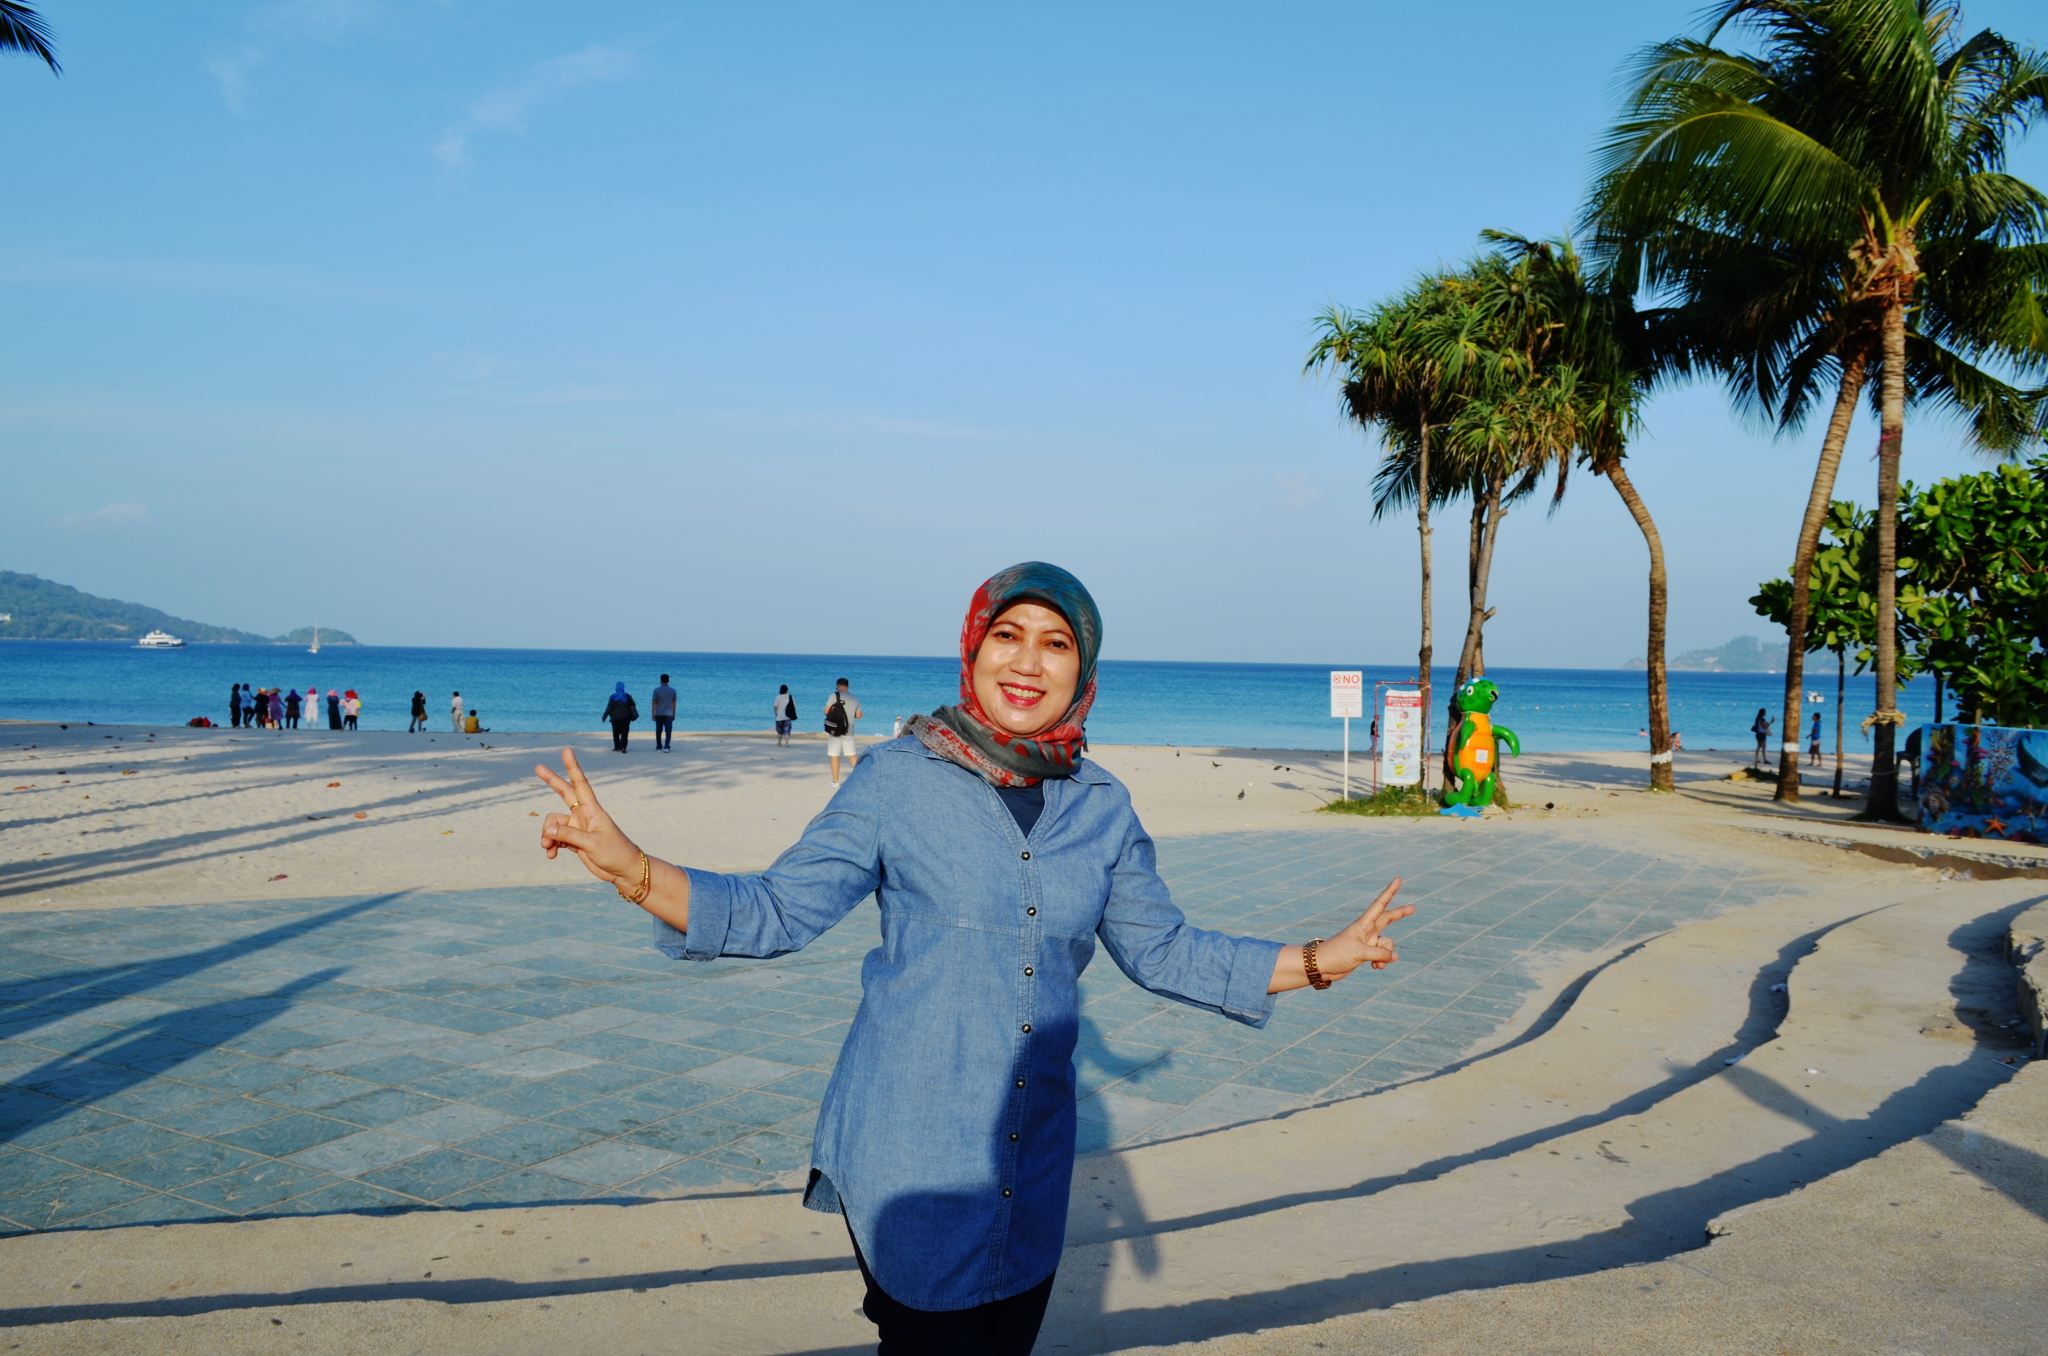 Di hari terakhir kami menyempatkan diri mengunjungi Patong Beach yang ...